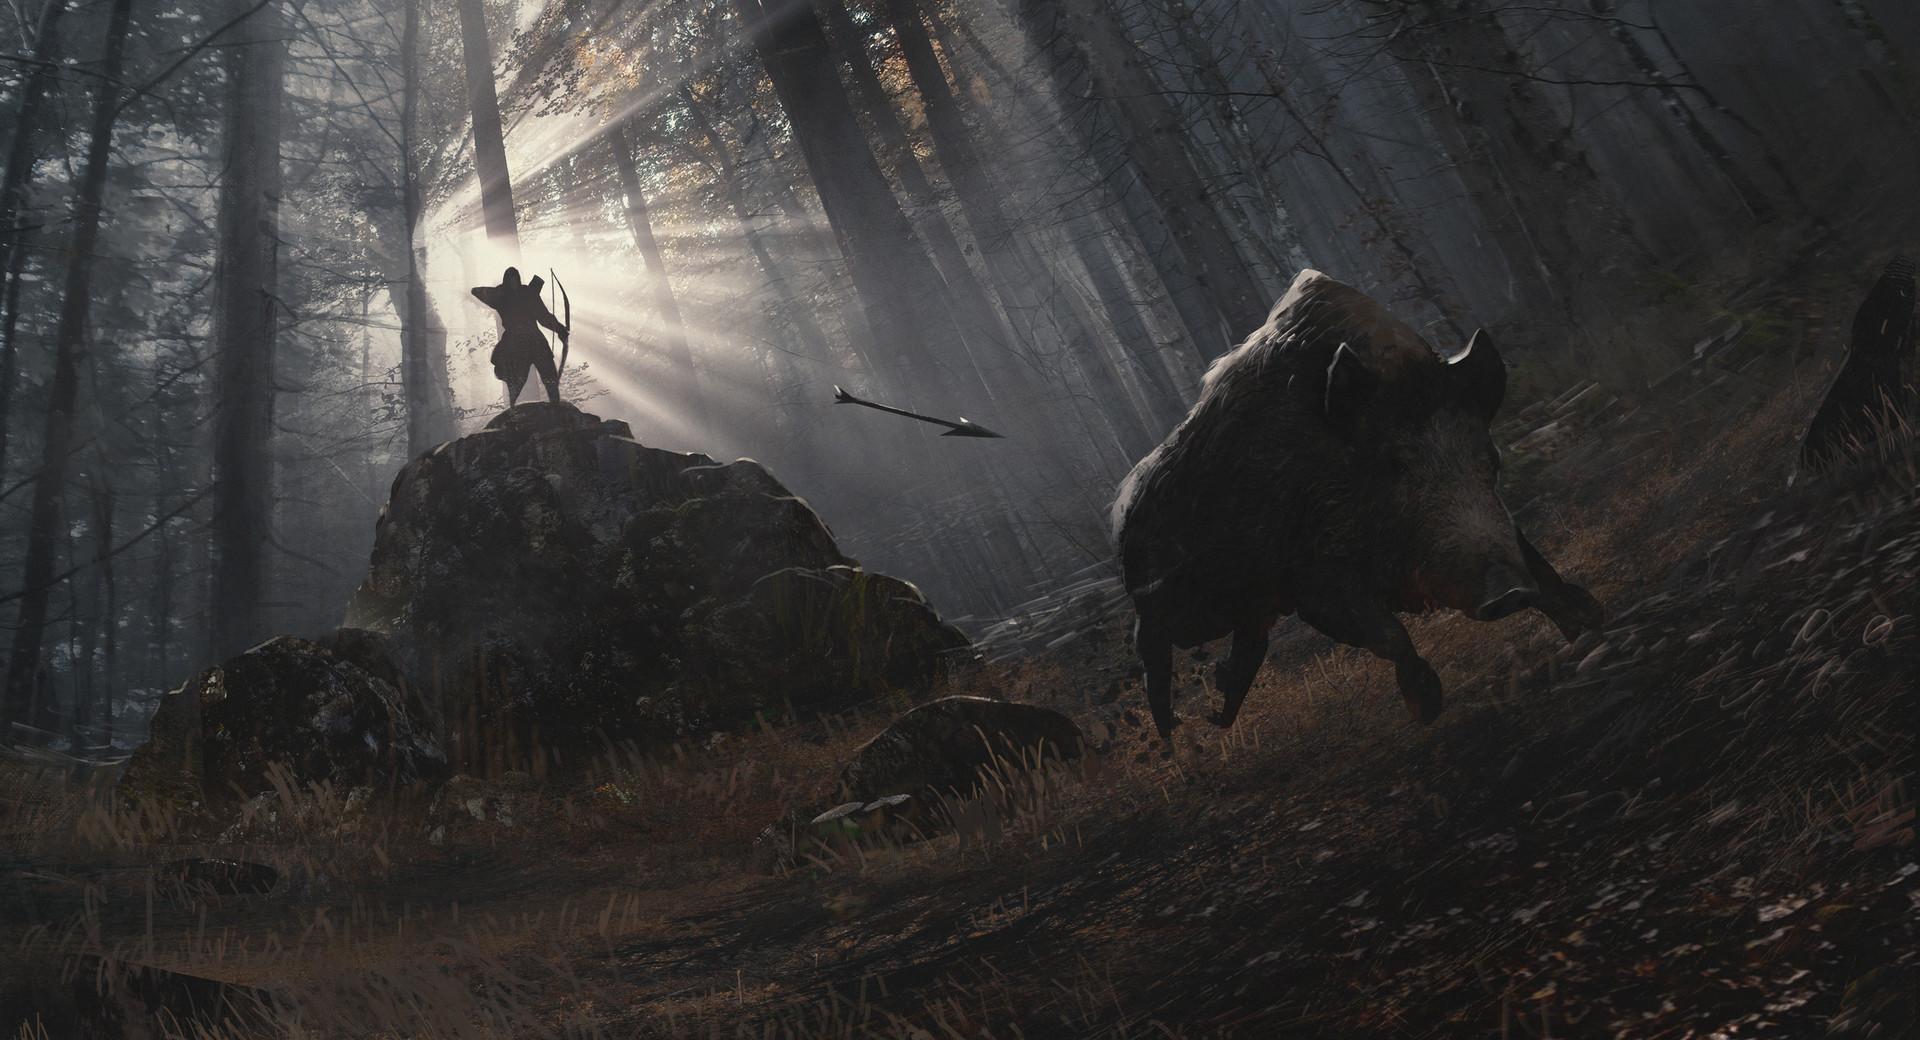 Вышел первый геймплей новой RPG Medieval Dynasty